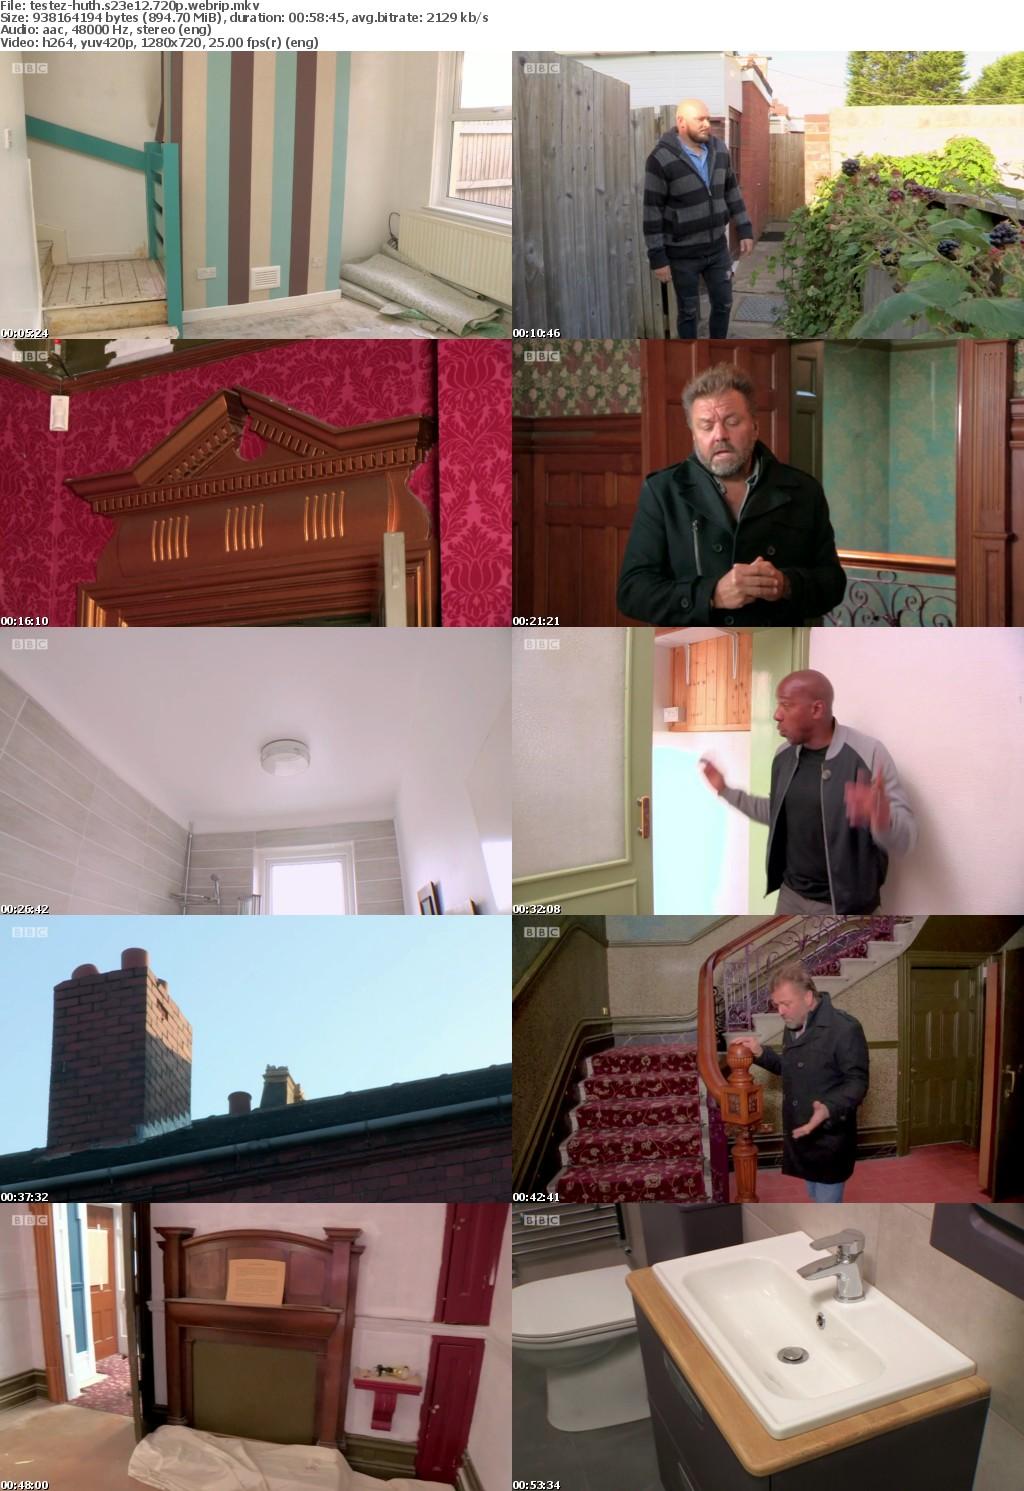 Homes Under the Hammer S23E12 720p WEBRip x264-TesTeZ